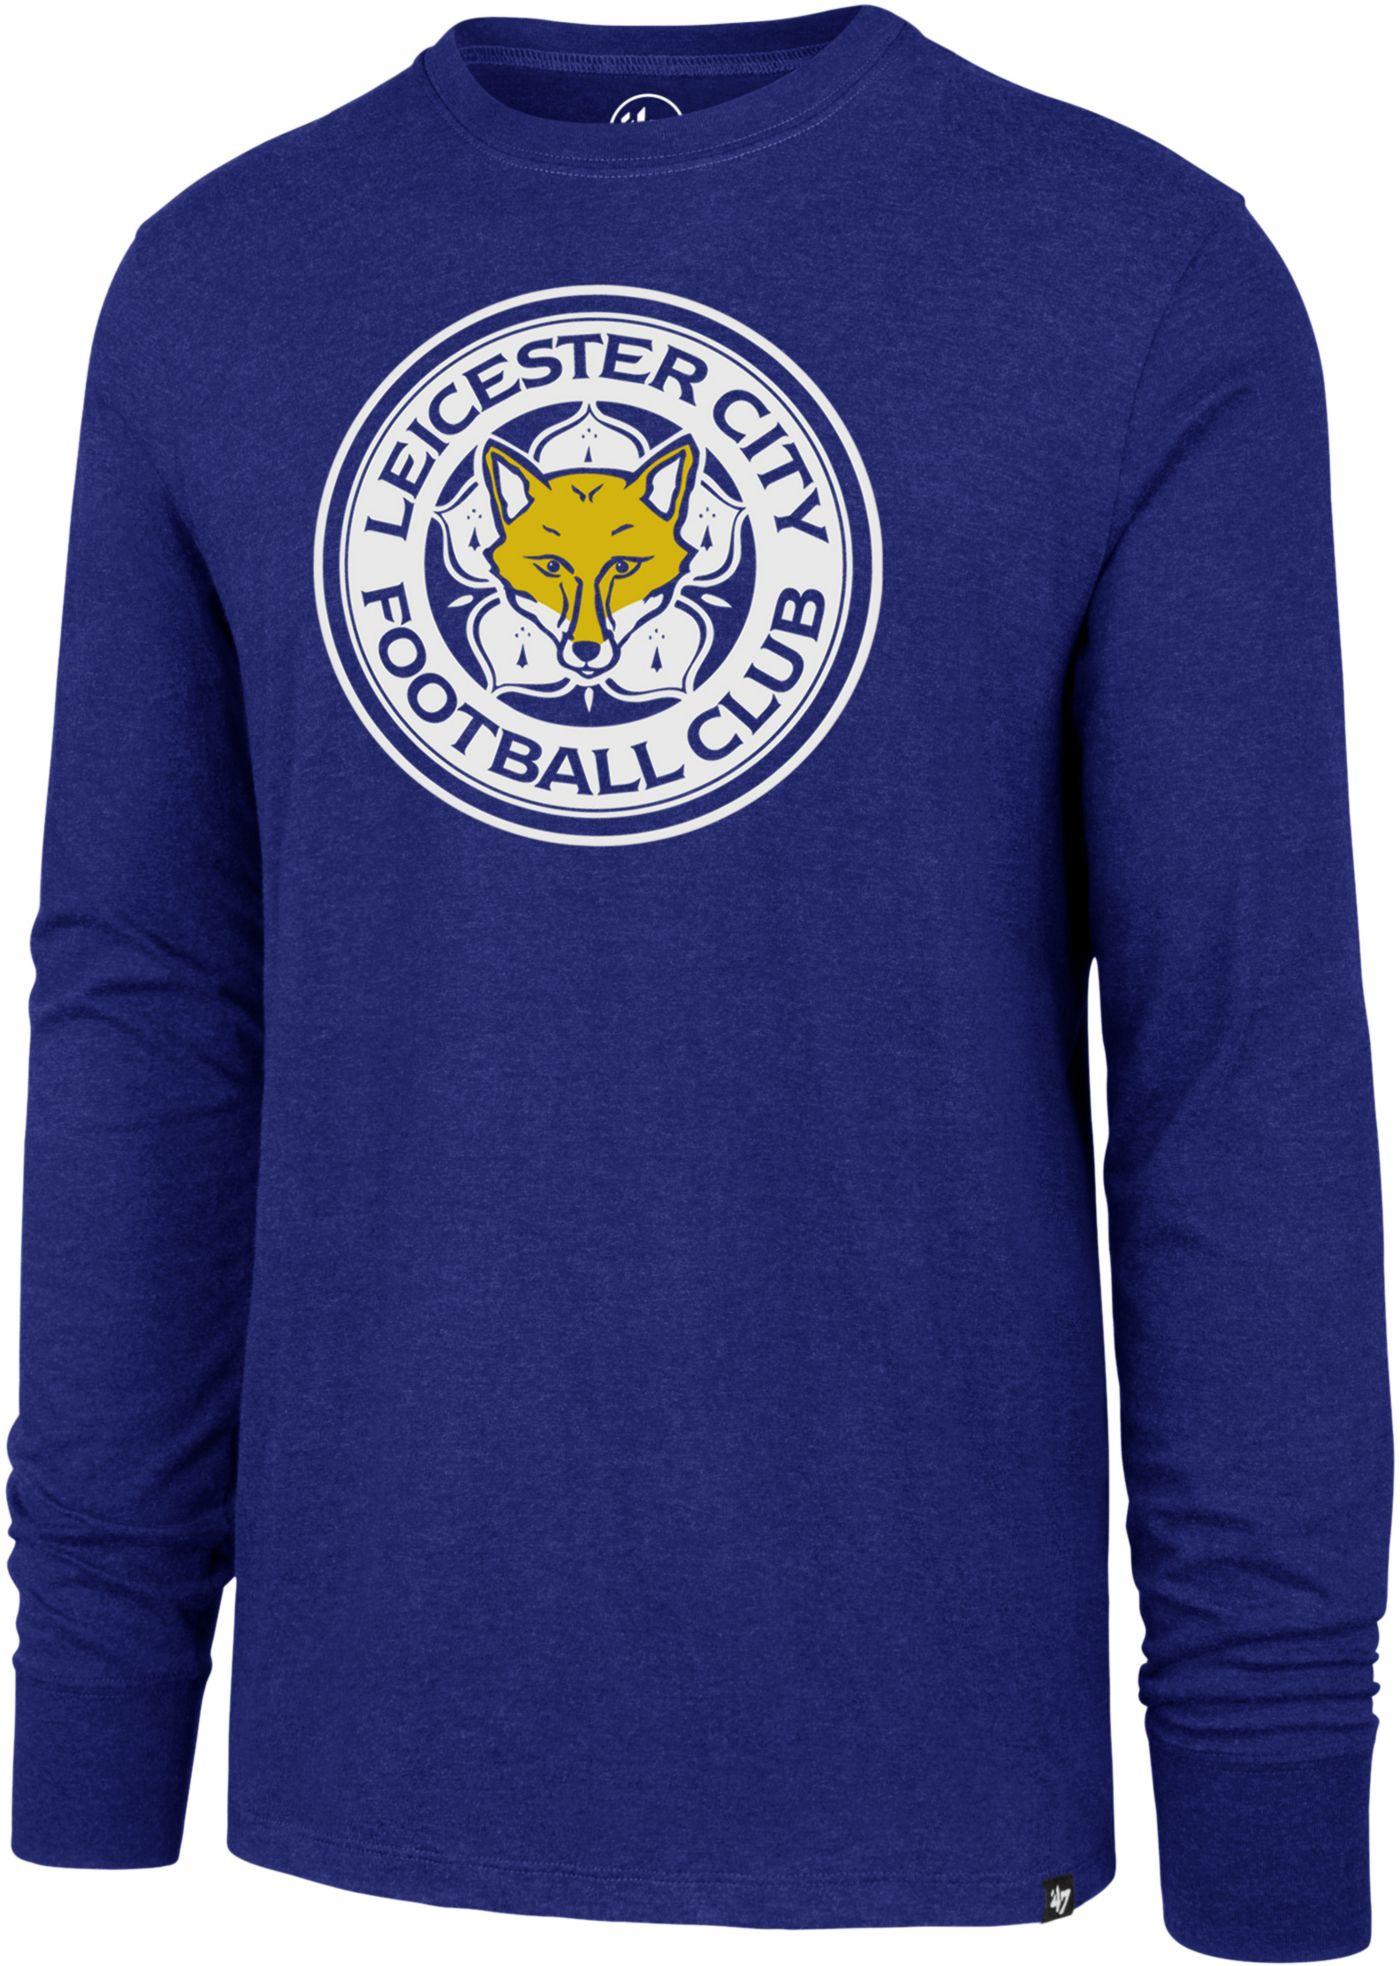 '47 Men's Leicester City Club Royal Long Sleeve Shirt